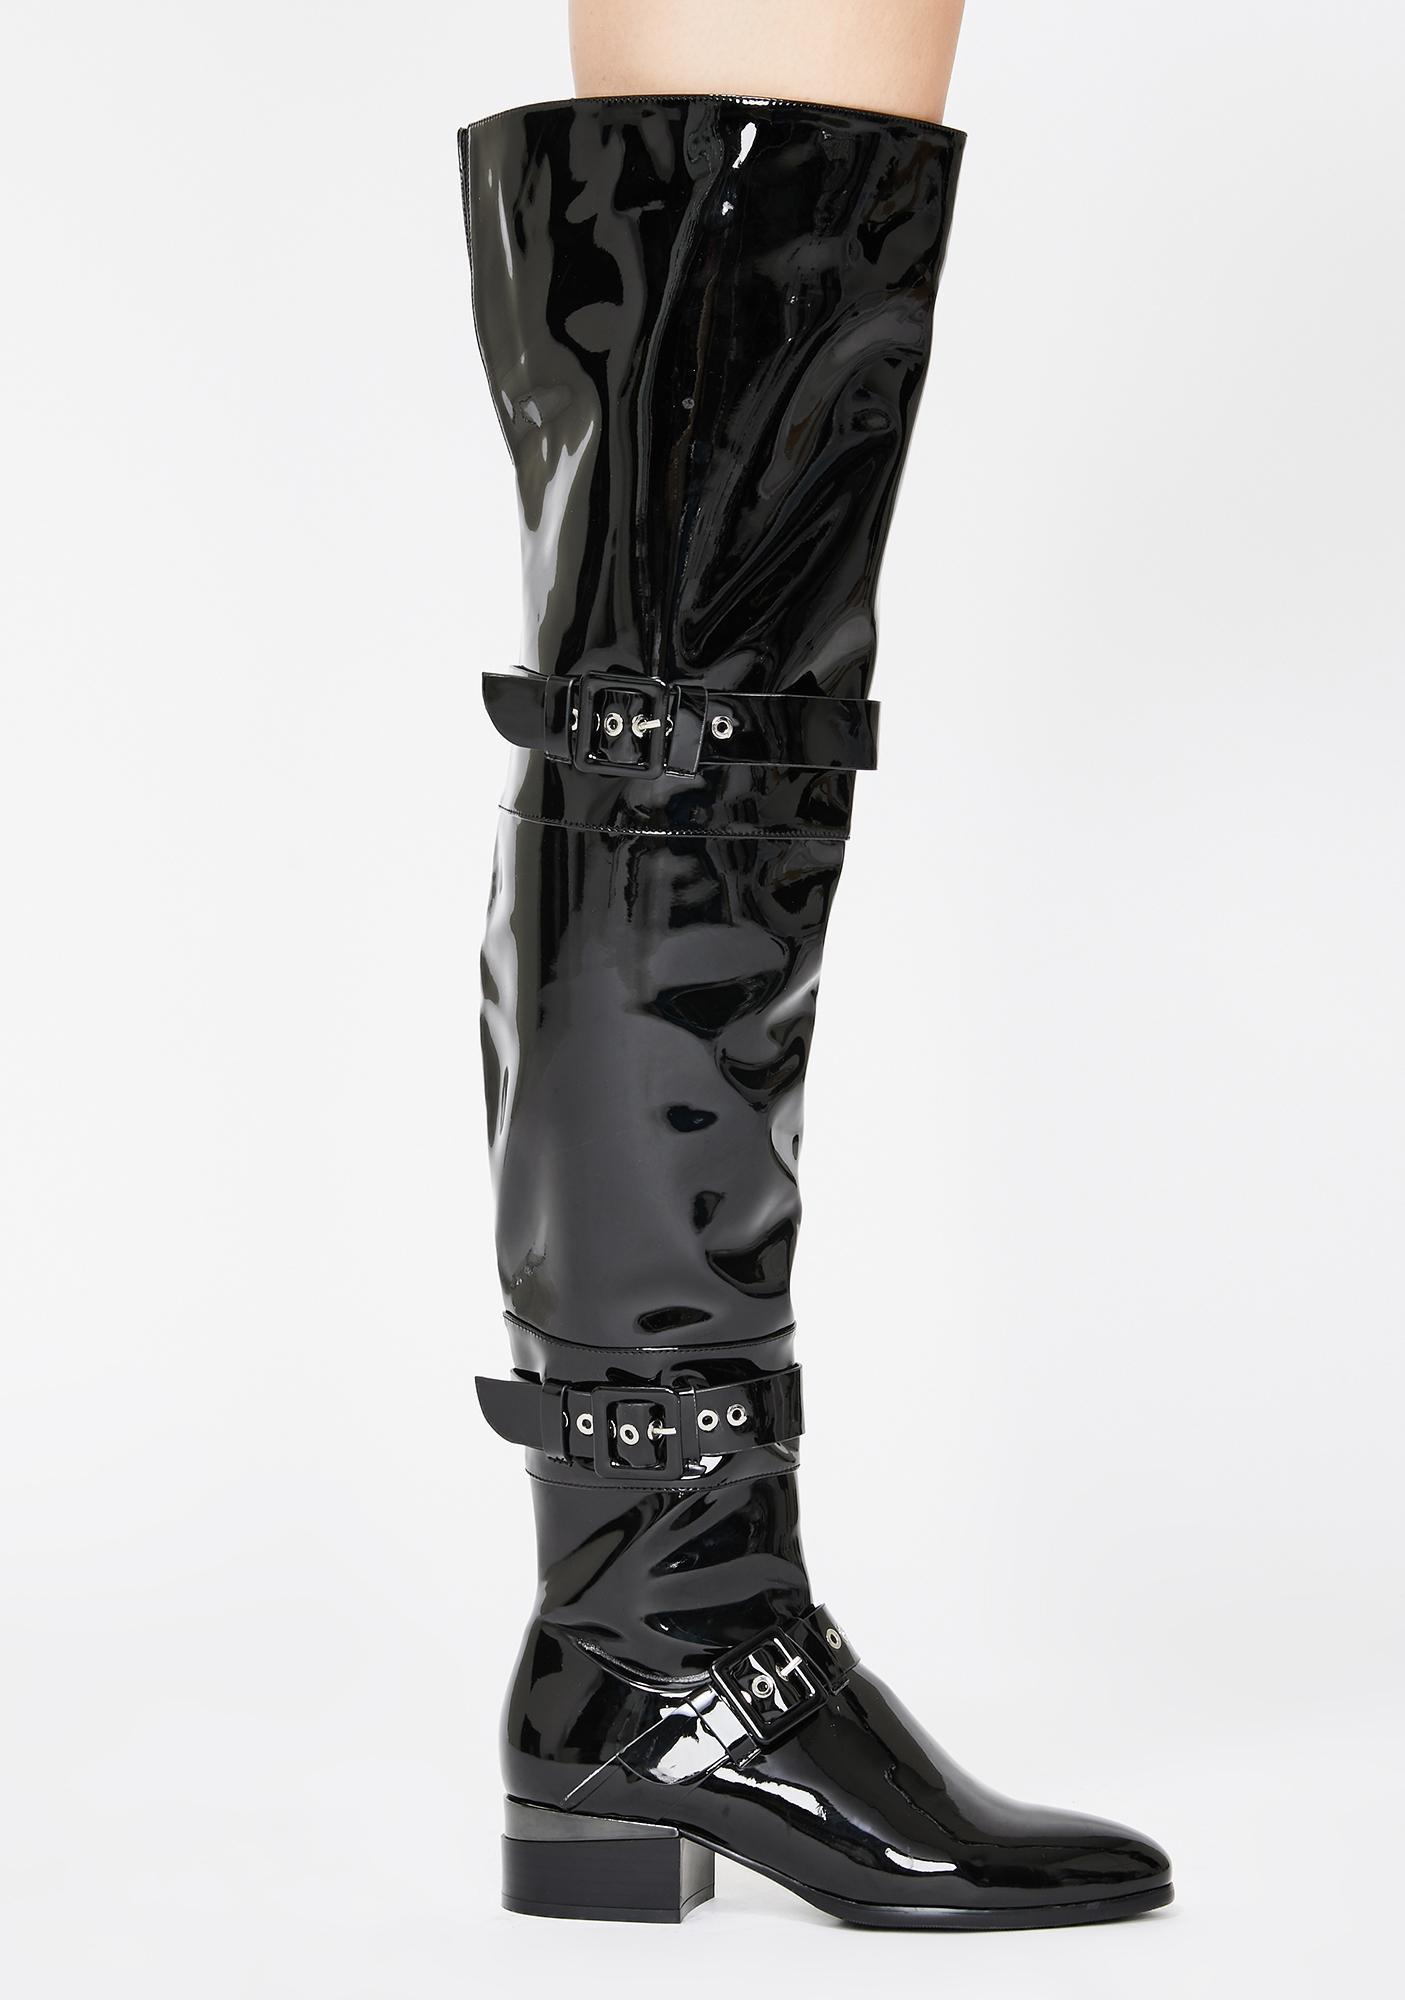 AZALEA WANG Sofia Thigh High Boots